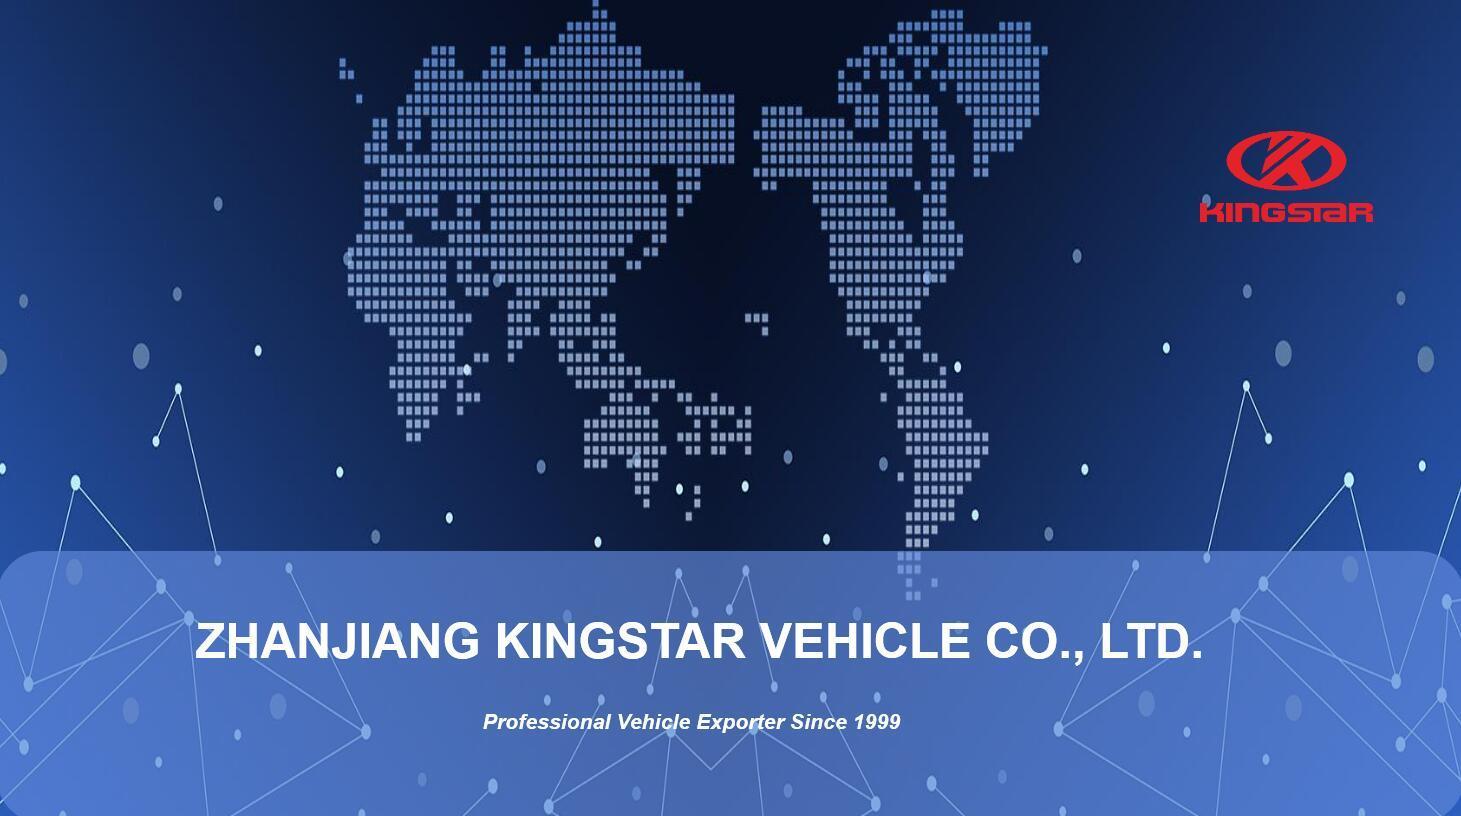 Carreta Venta caliente Snack coche KINGSTAR